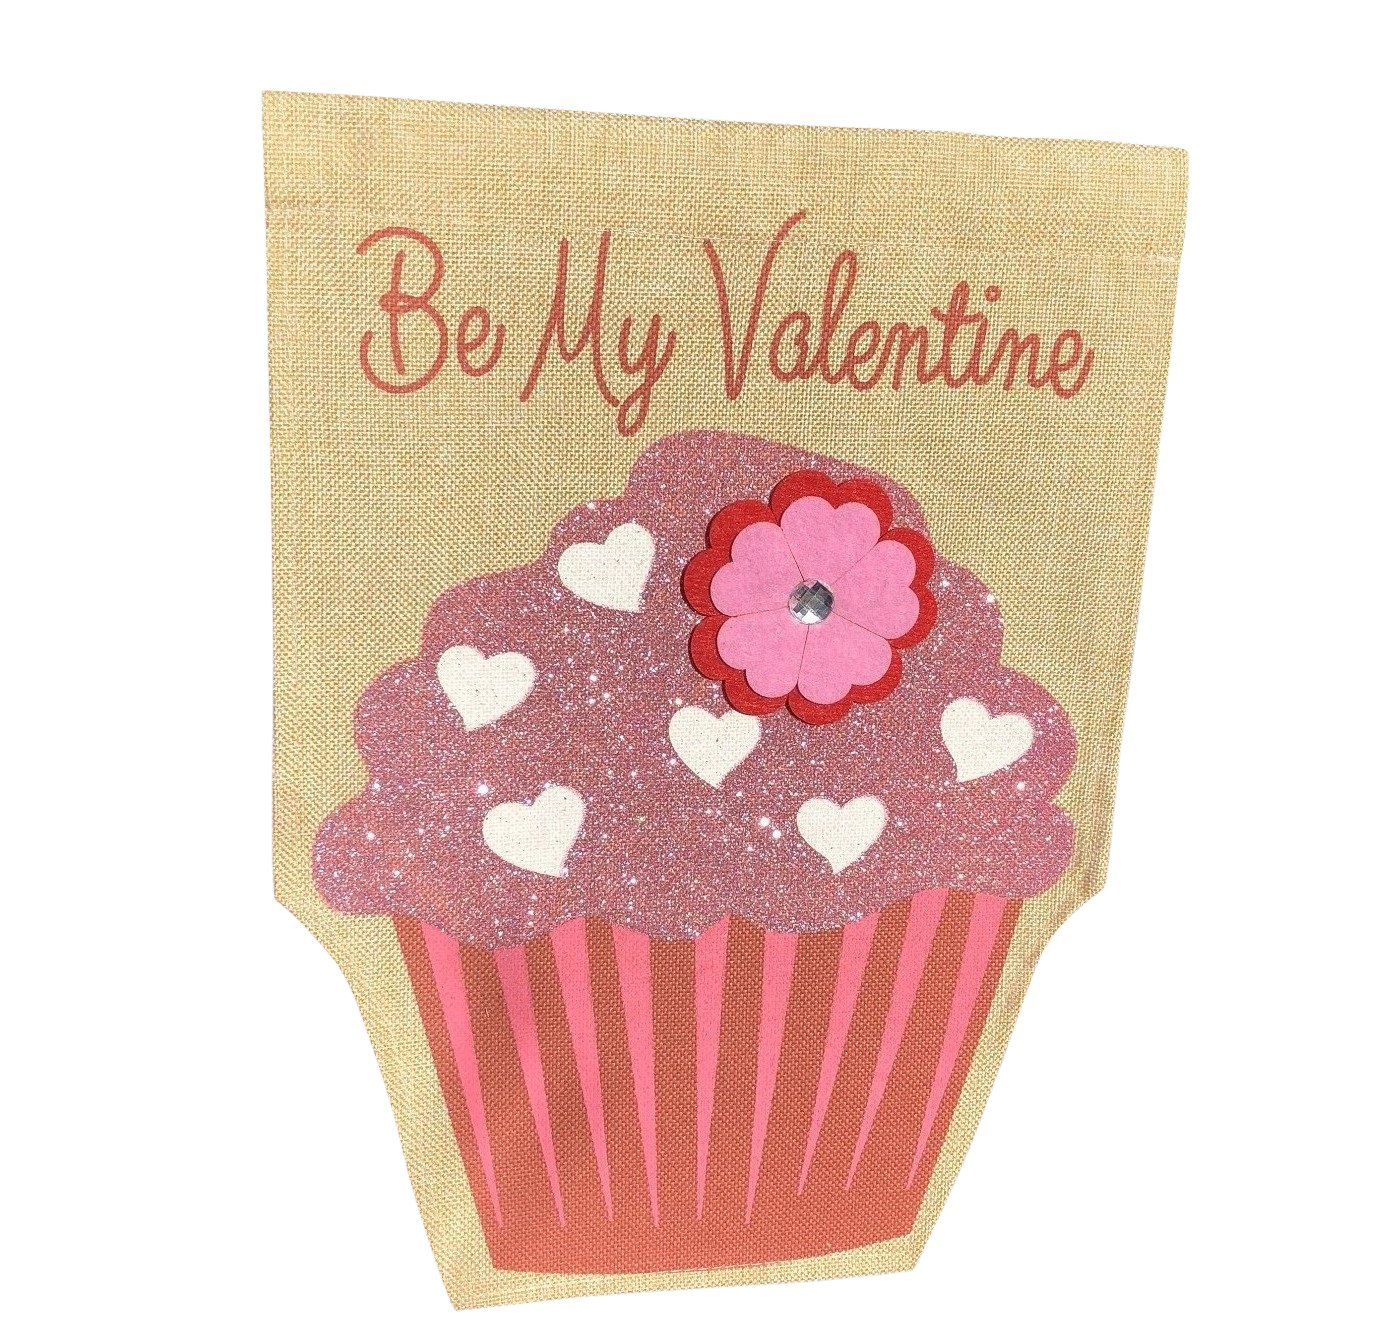 "Jolly Jon Happy Valentine's Day Garden Flag - Be My Valentine Burlap Flag – One Sided Yard Décor Decoration - Glitter Cupcake & Flower Applique Design - 12"" x 17"" Size"